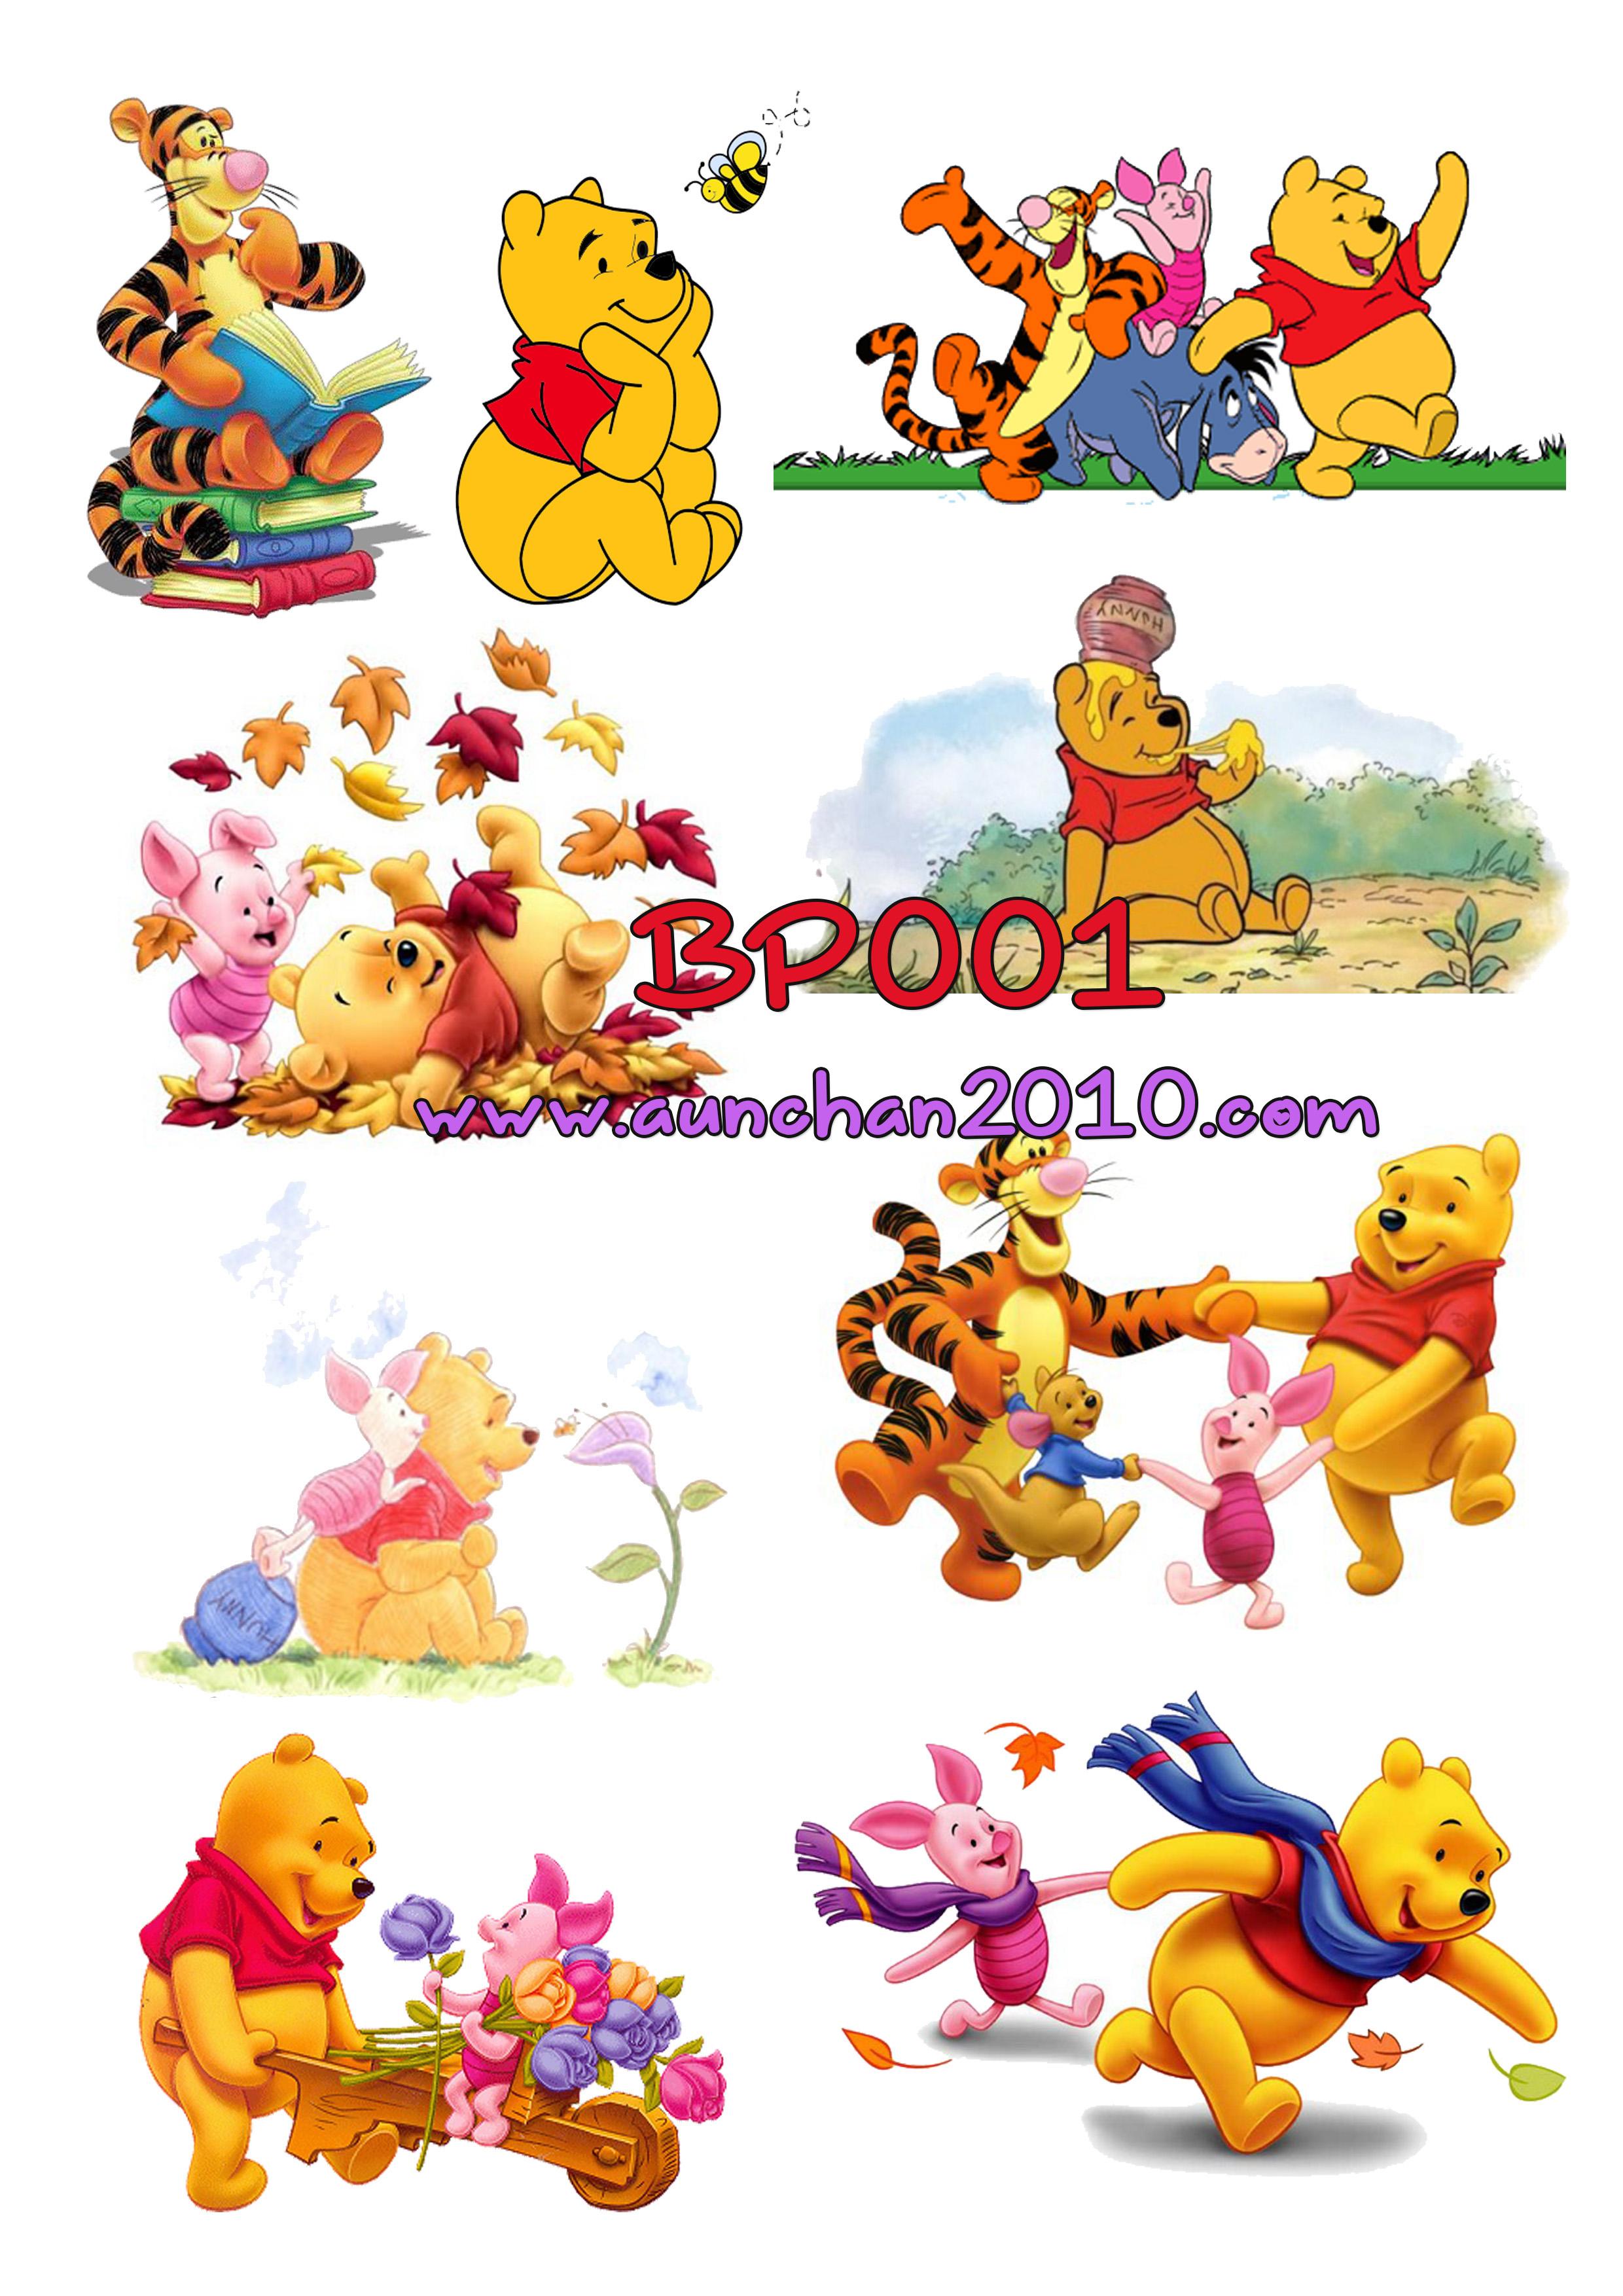 BP001 กระดาษแนพกิ้น 21x30ซม. ลายหมีพูห์